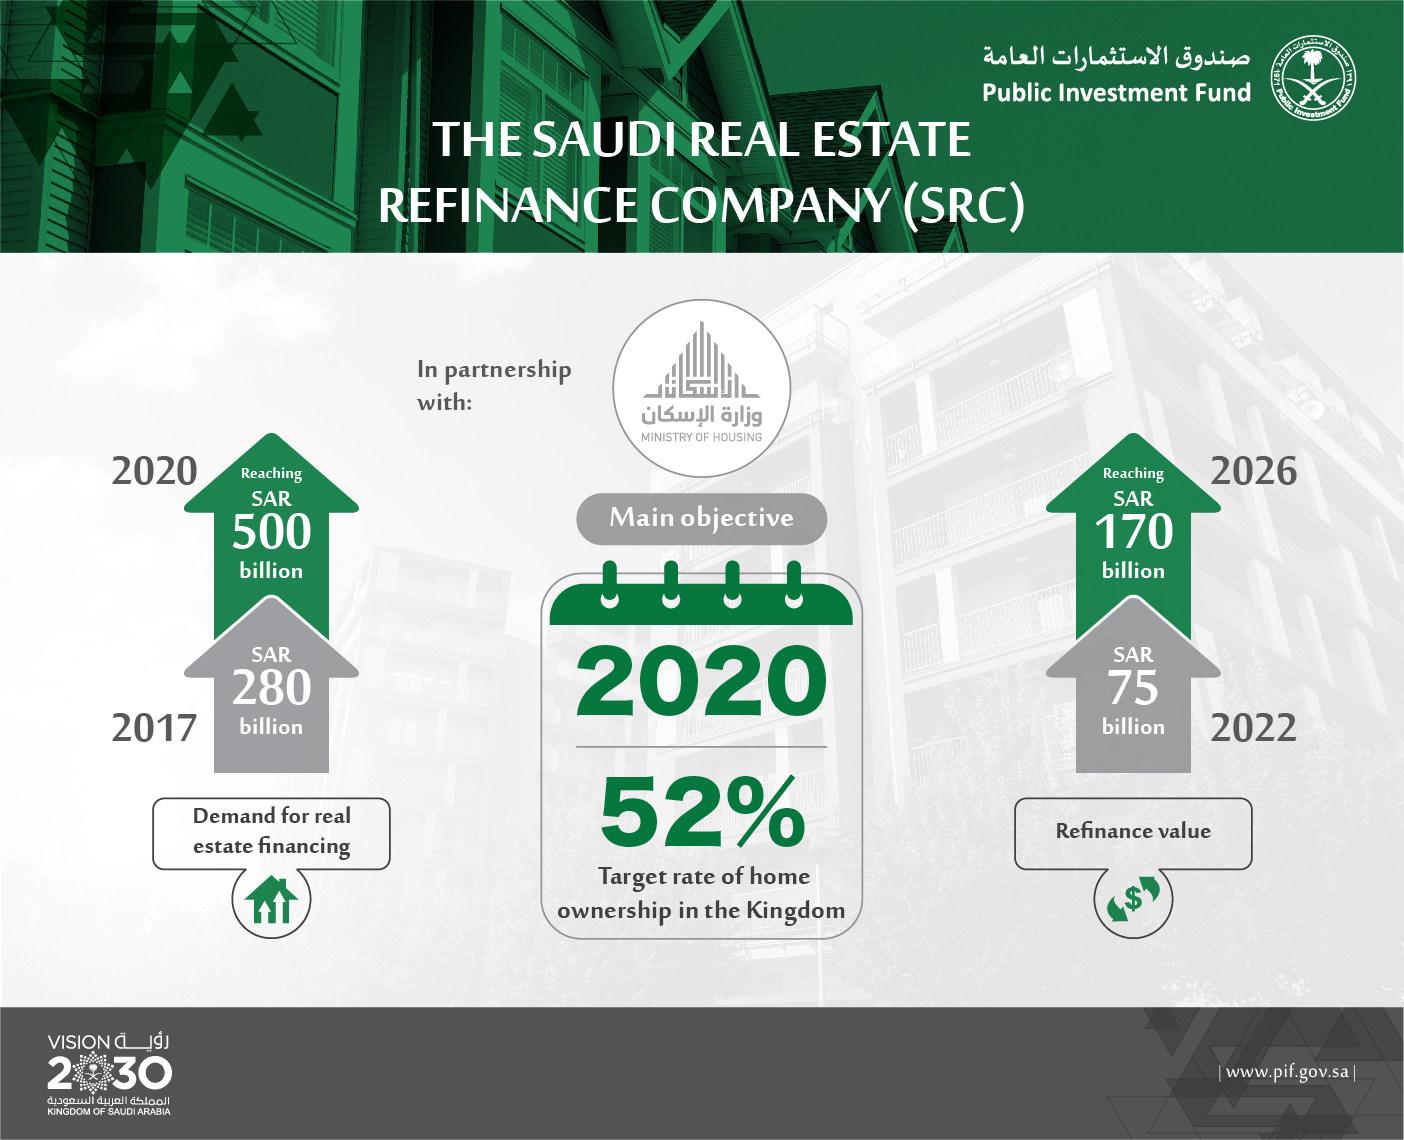 The Public Investment Fund Launches the Saudi Real Estate Refinance Company (SRC) (PRNewsfoto/The Public Investment Fund)